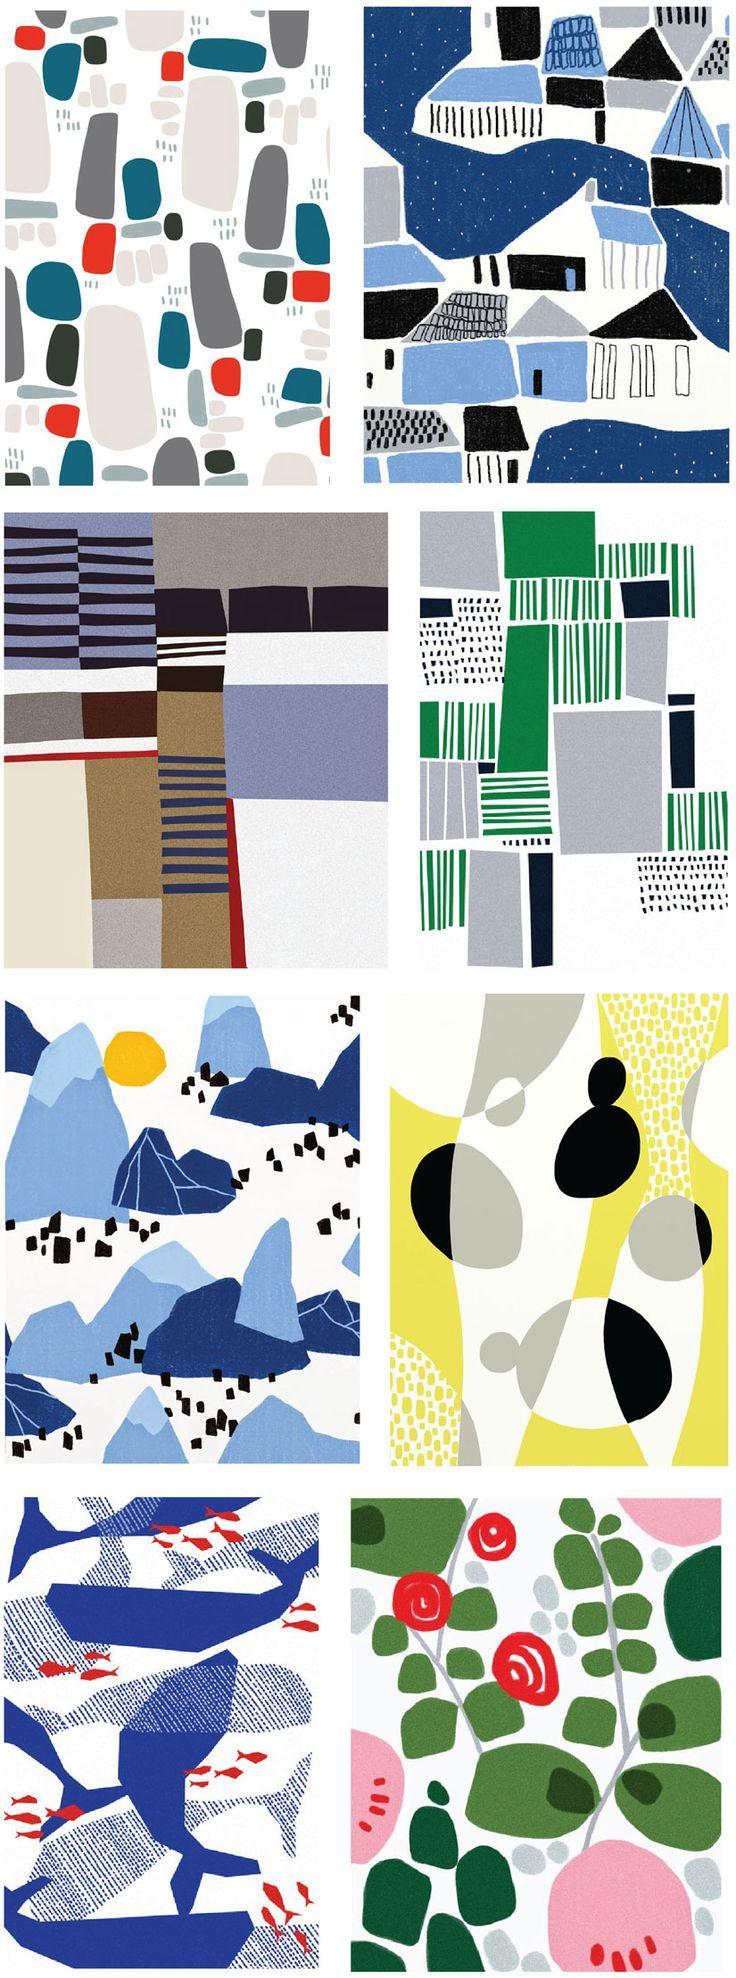 Ophelia-Pang patterns